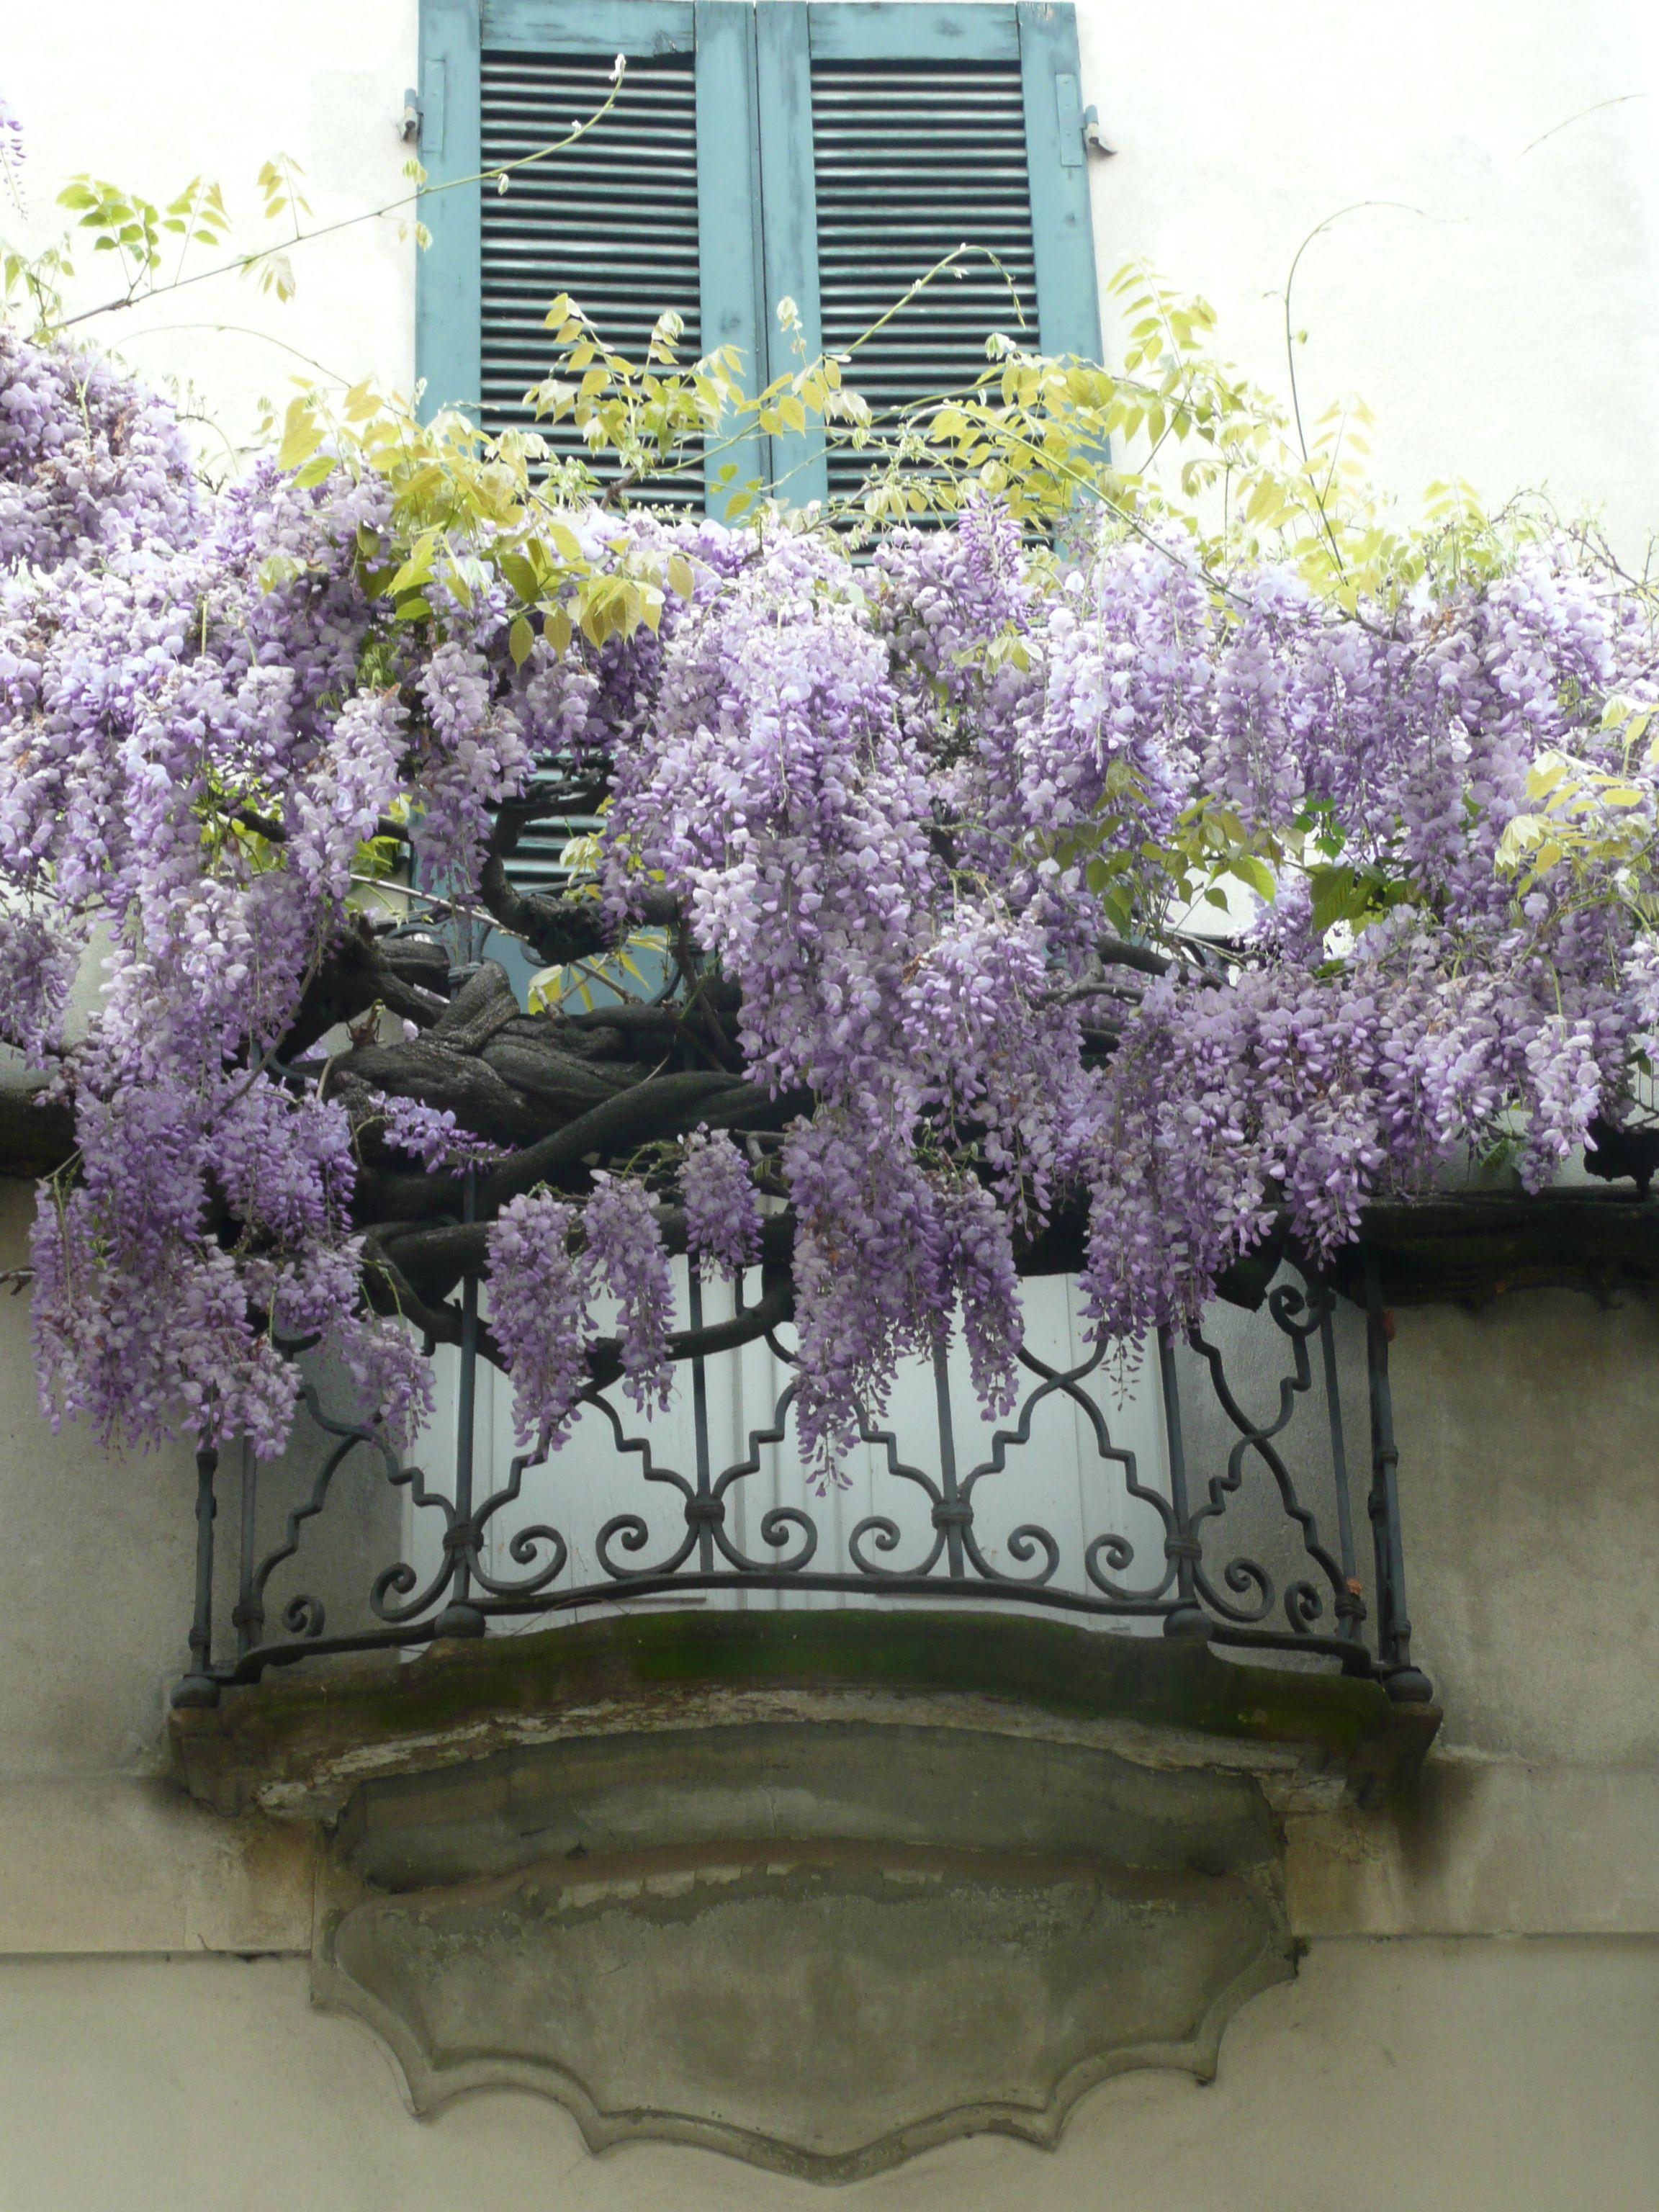 Balcony Wisteria Crema Italia Wisteria Plant Balcony Flowers Flowering Vines